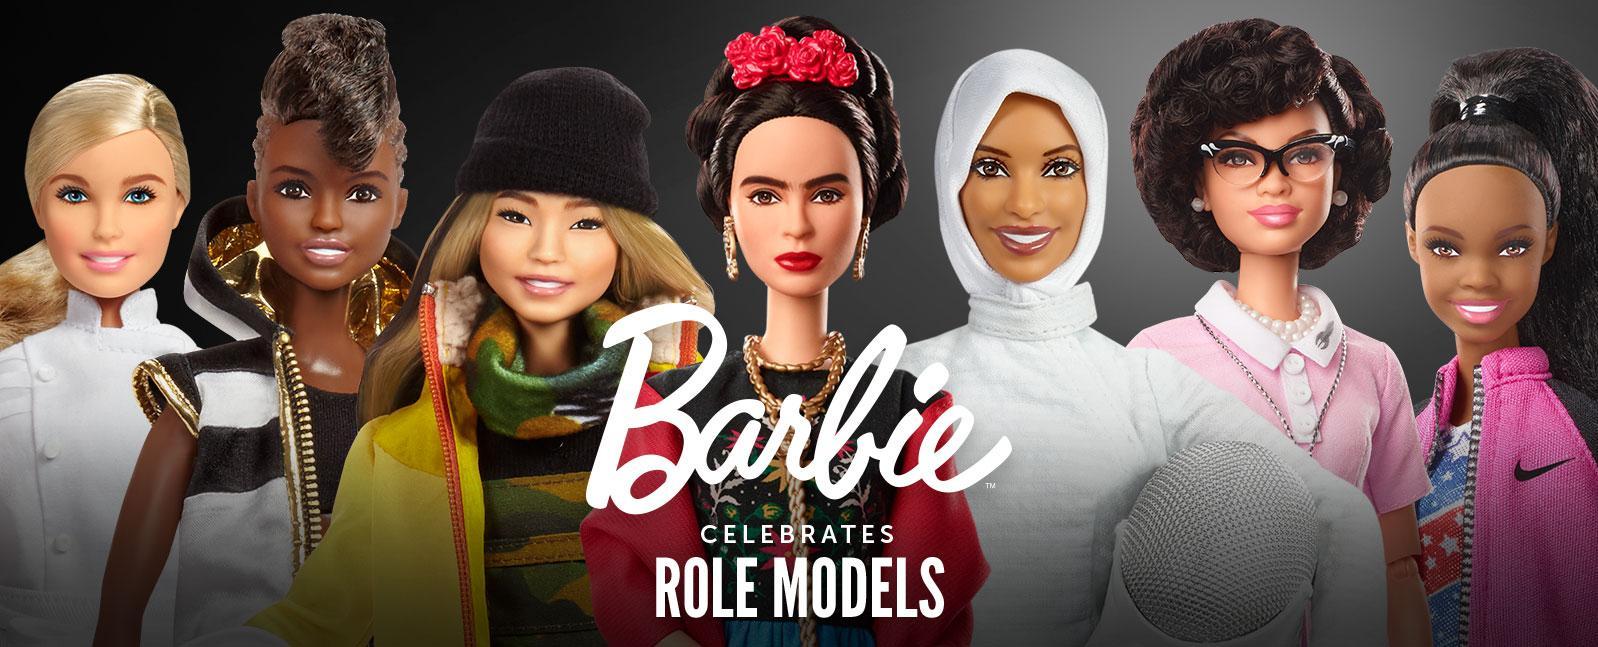 Barbie celebrates role models series